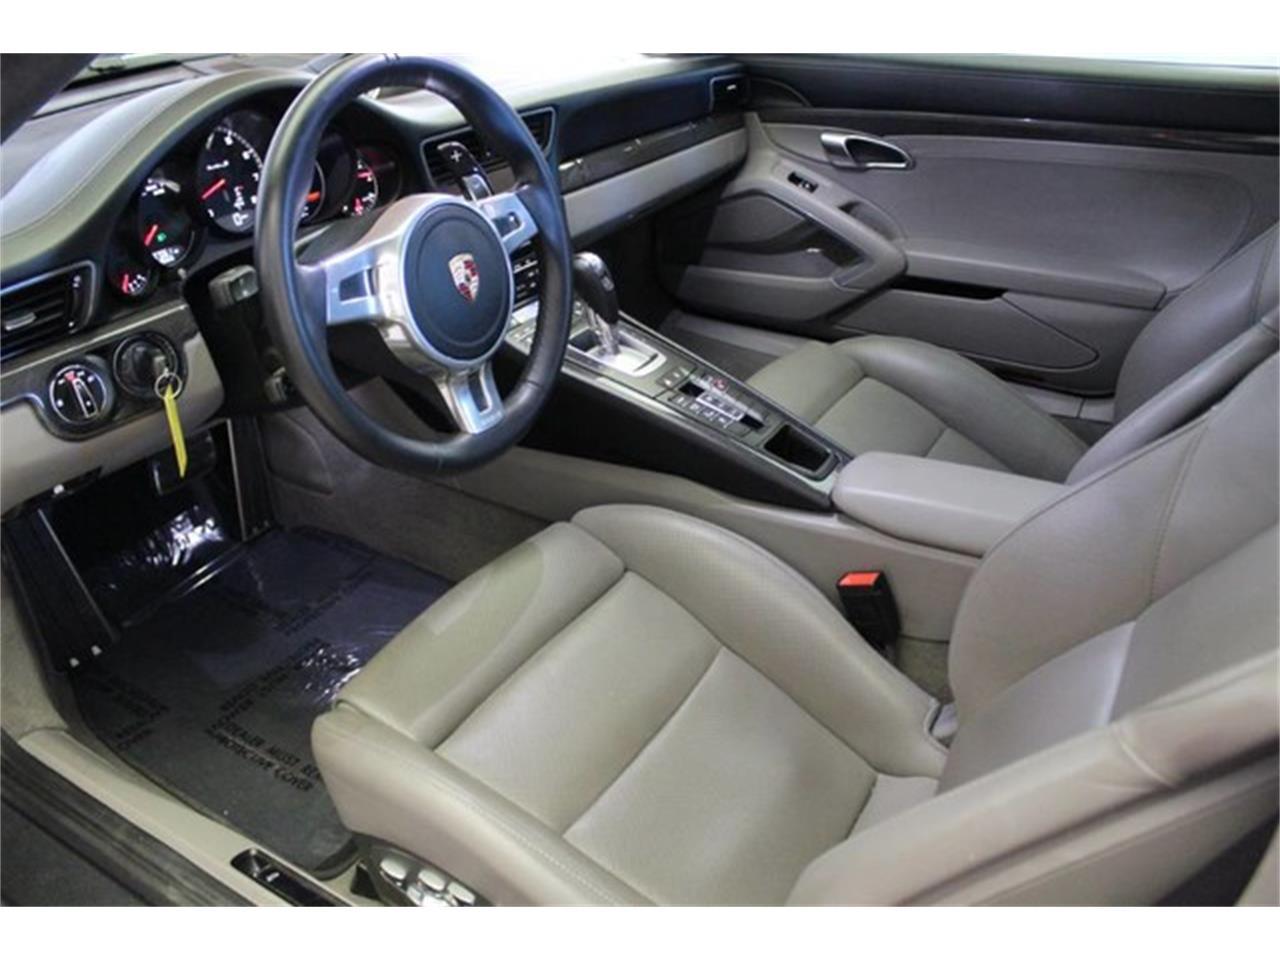 2014 Porsche 911 (CC-1251157) for sale in Anaheim, California